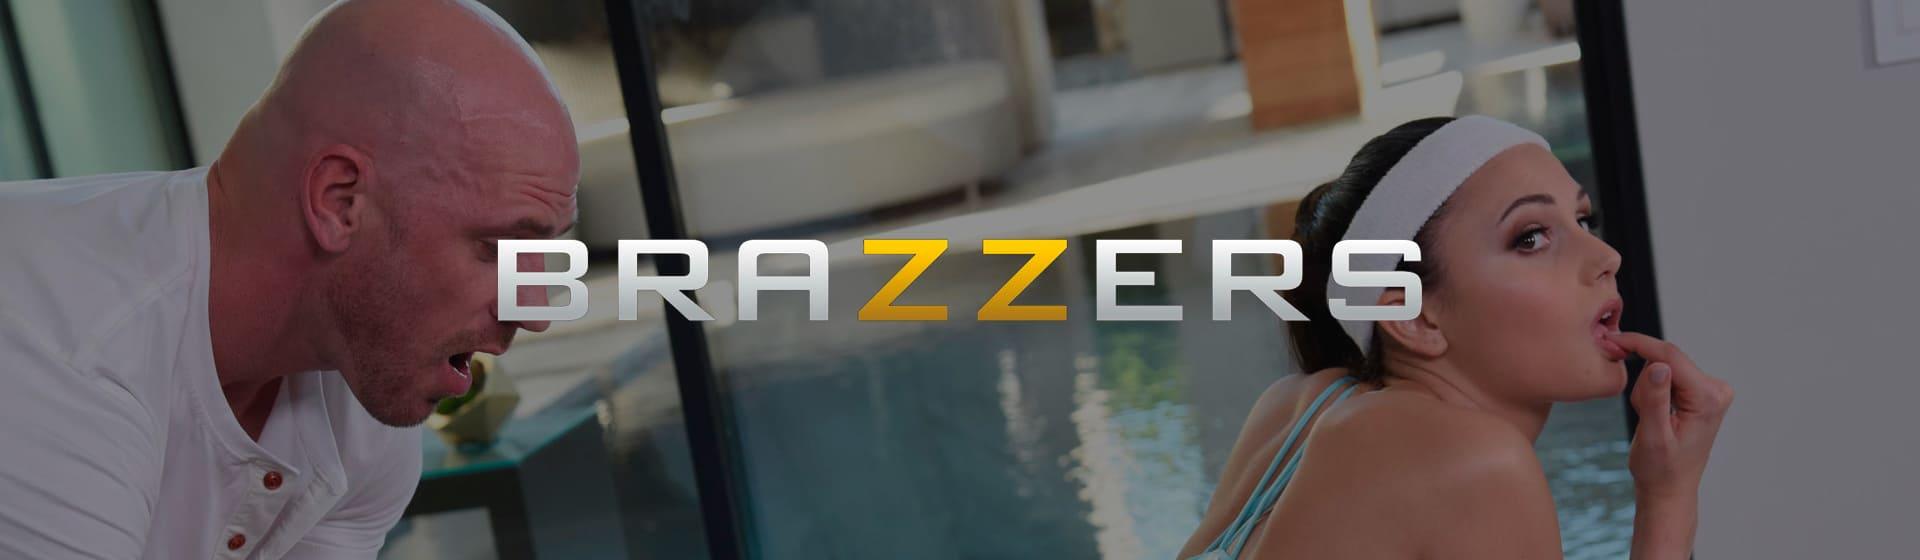 Brazzers - Мерч и одежда с атрибутикой